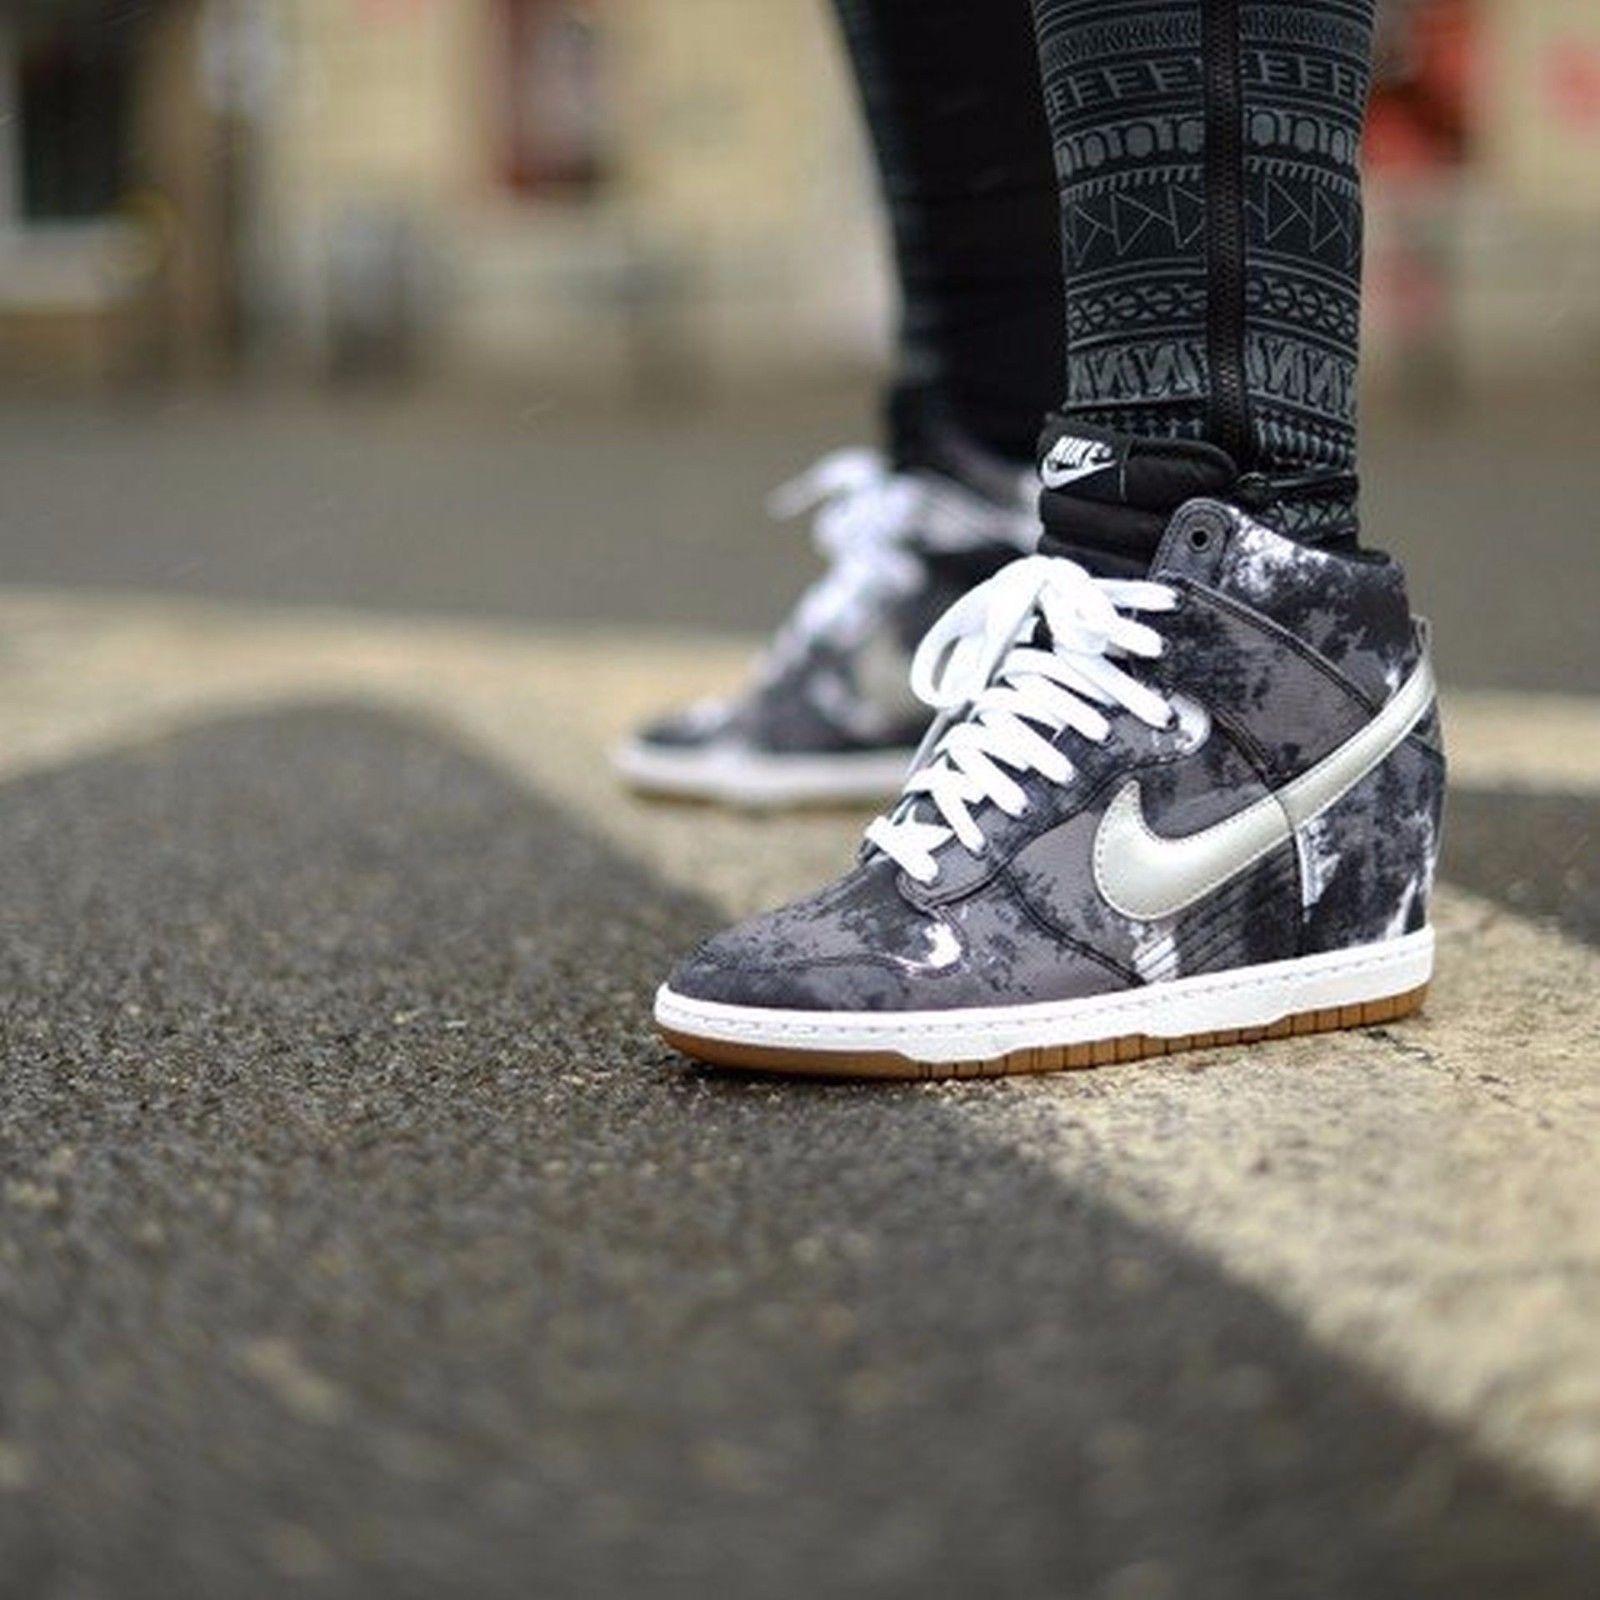 Nike Dunk Hi Sky Print Womens Shoes Size 7 543258-004 Black Metallic Silver